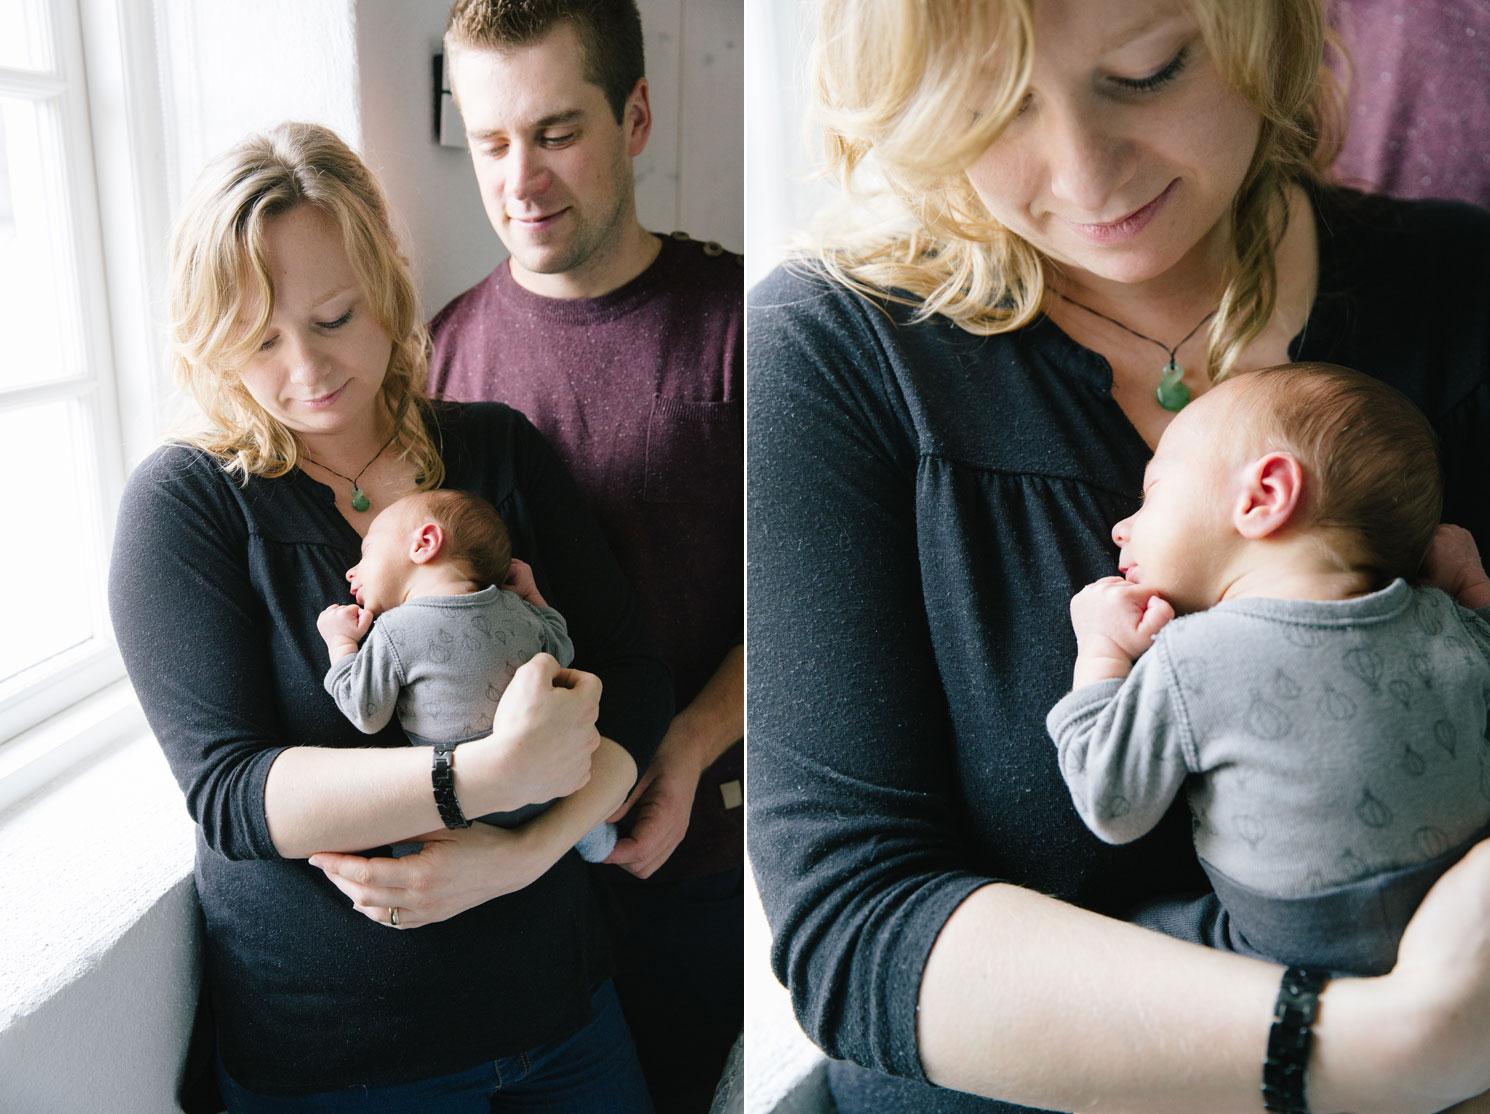 first-moments-nyfodd-familjefotografering-nyfoddfotografering-beloved-moment-design-maria-o-photo-hemmiljo